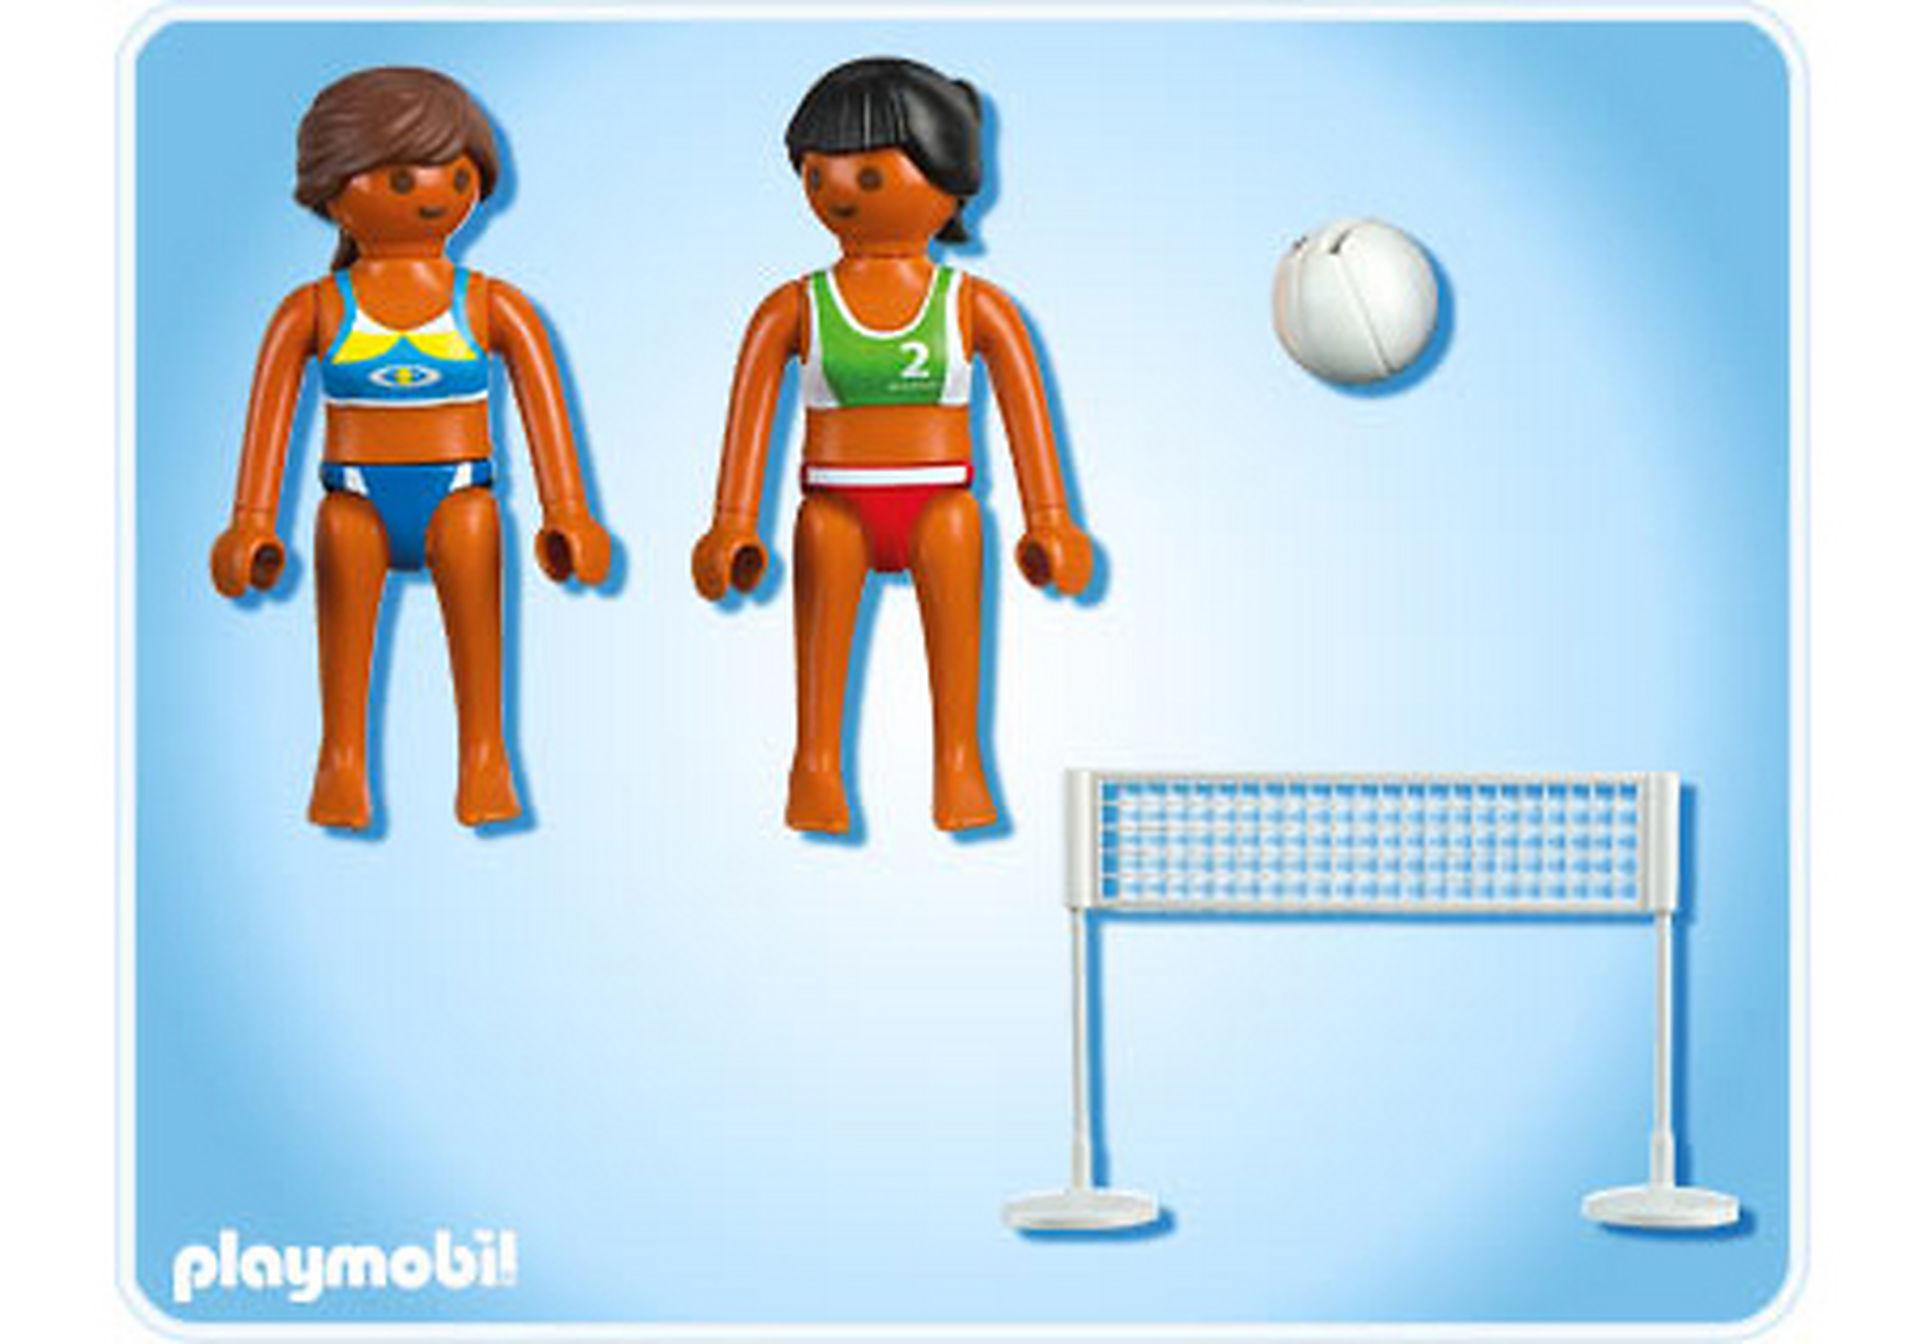 5188-A Beachvolleyball mit Netz zoom image2